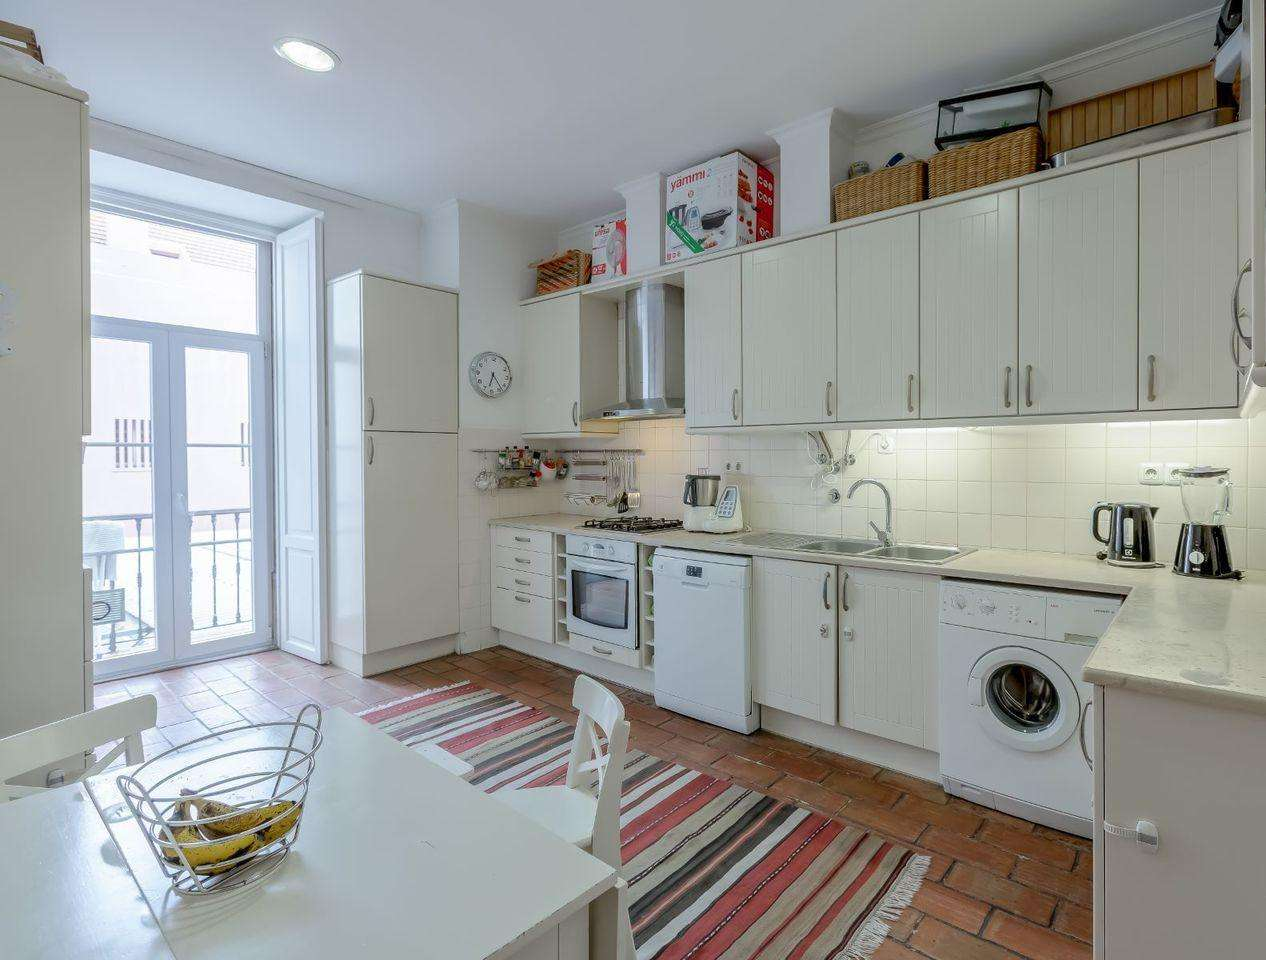 Apartamento para comprar, Santa Clara, Lisboa - Foto 11